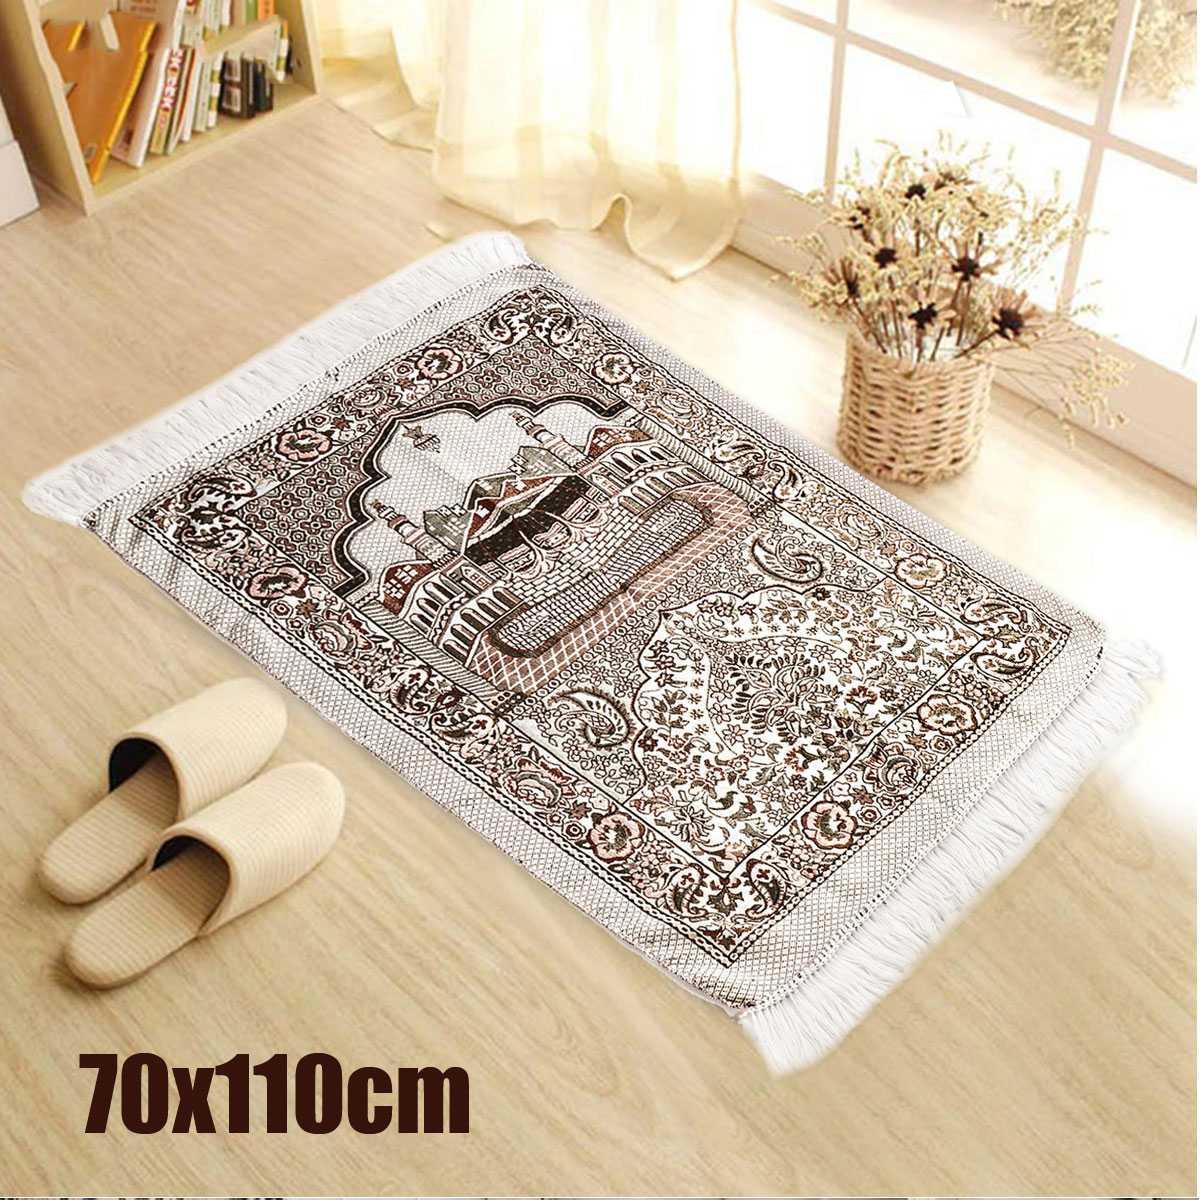 Bohemian Islamic Muslim Prayer Rug Carpet Mat Polyester Namaz Salat Tassel Tablecloth Cover Yoga Mat Blanket Decoration 70x110cm